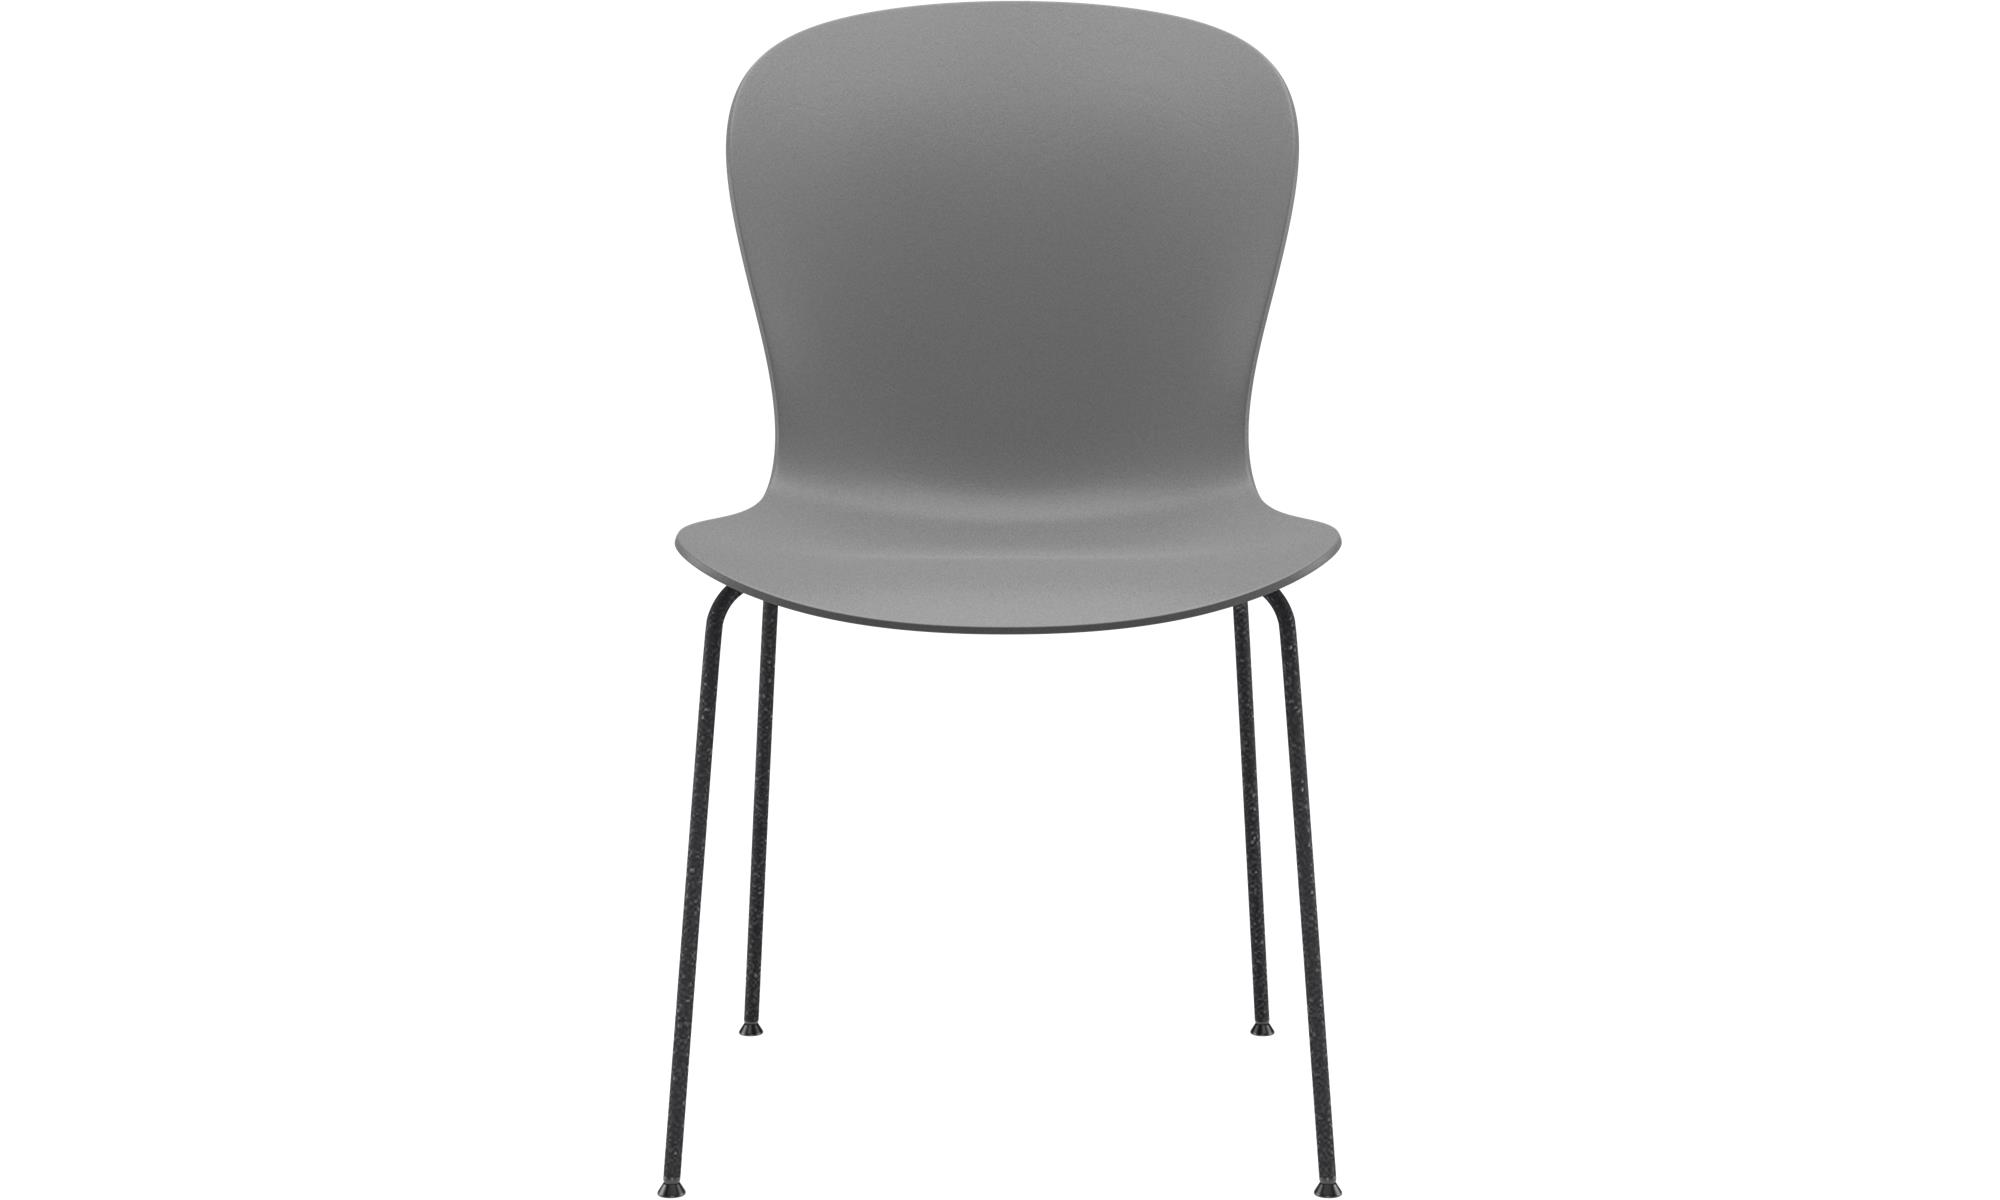 chaises de salle manger chaise adelaide pour usage. Black Bedroom Furniture Sets. Home Design Ideas